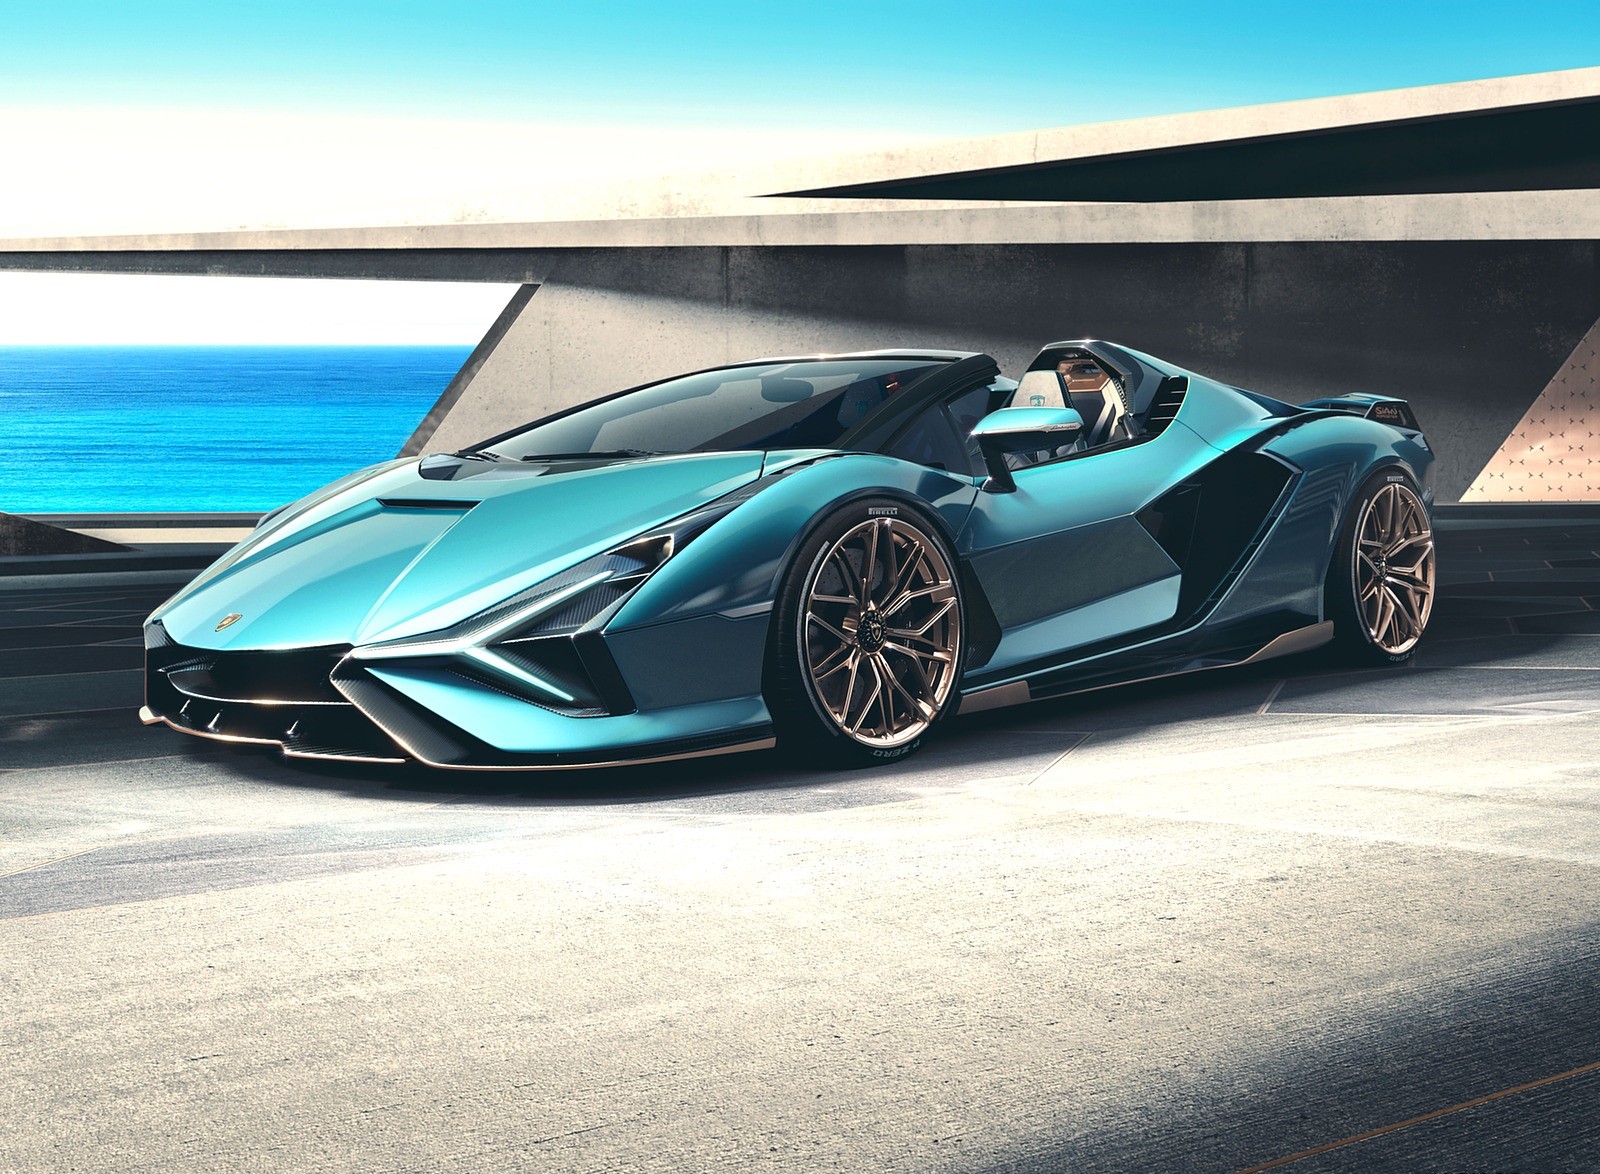 2021 Lamborghini Sián Roadster Front Three-Quarter Wallpapers #3 of 19